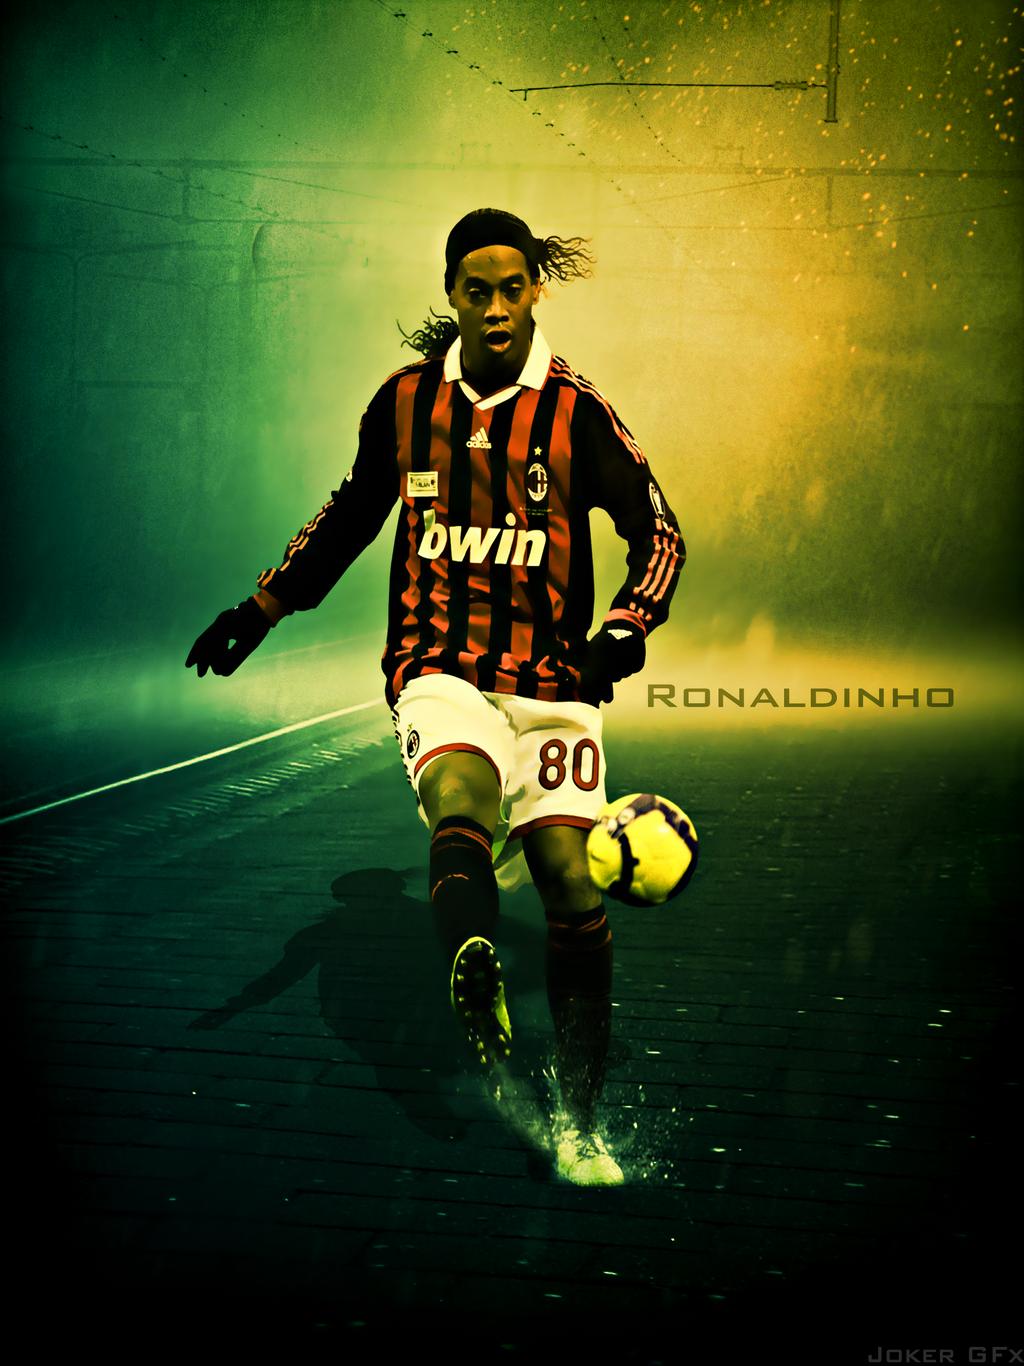 Ronaldinho wallpaper by eljokergfx on deviantart - Ronaldinho wallpaper ...